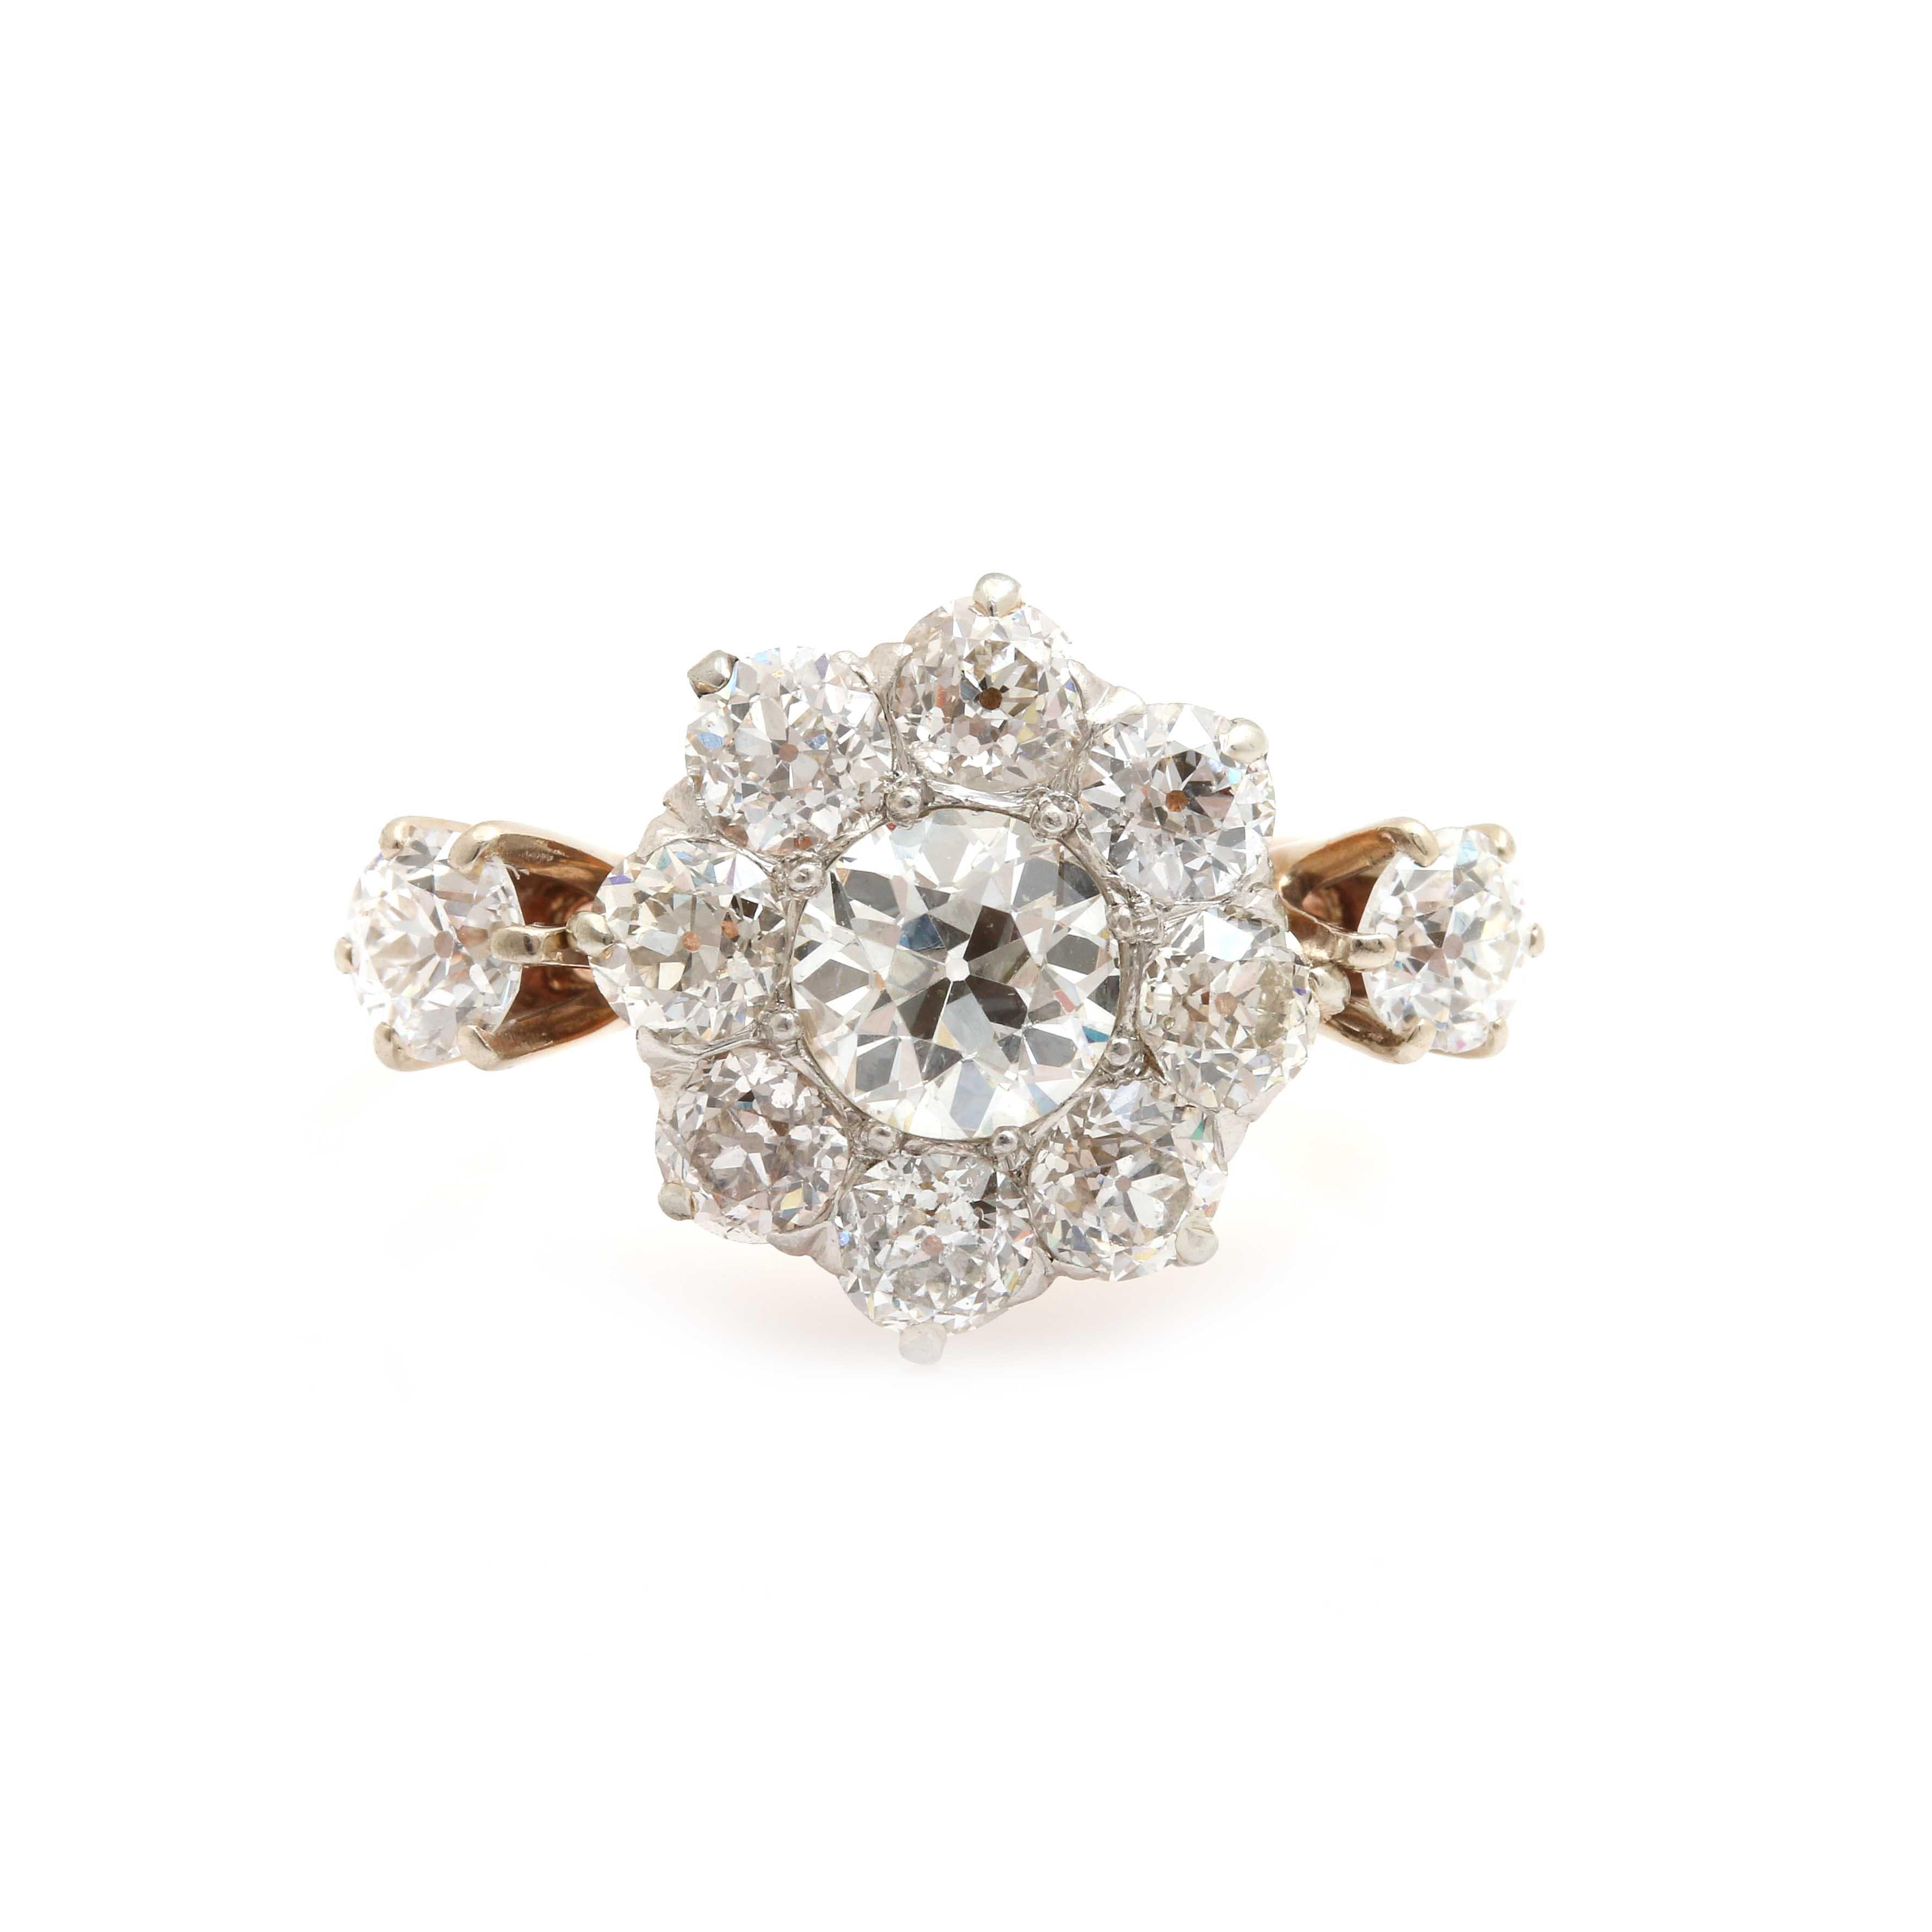 14K Yellow Gold 1.78 CTW Diamond Ring